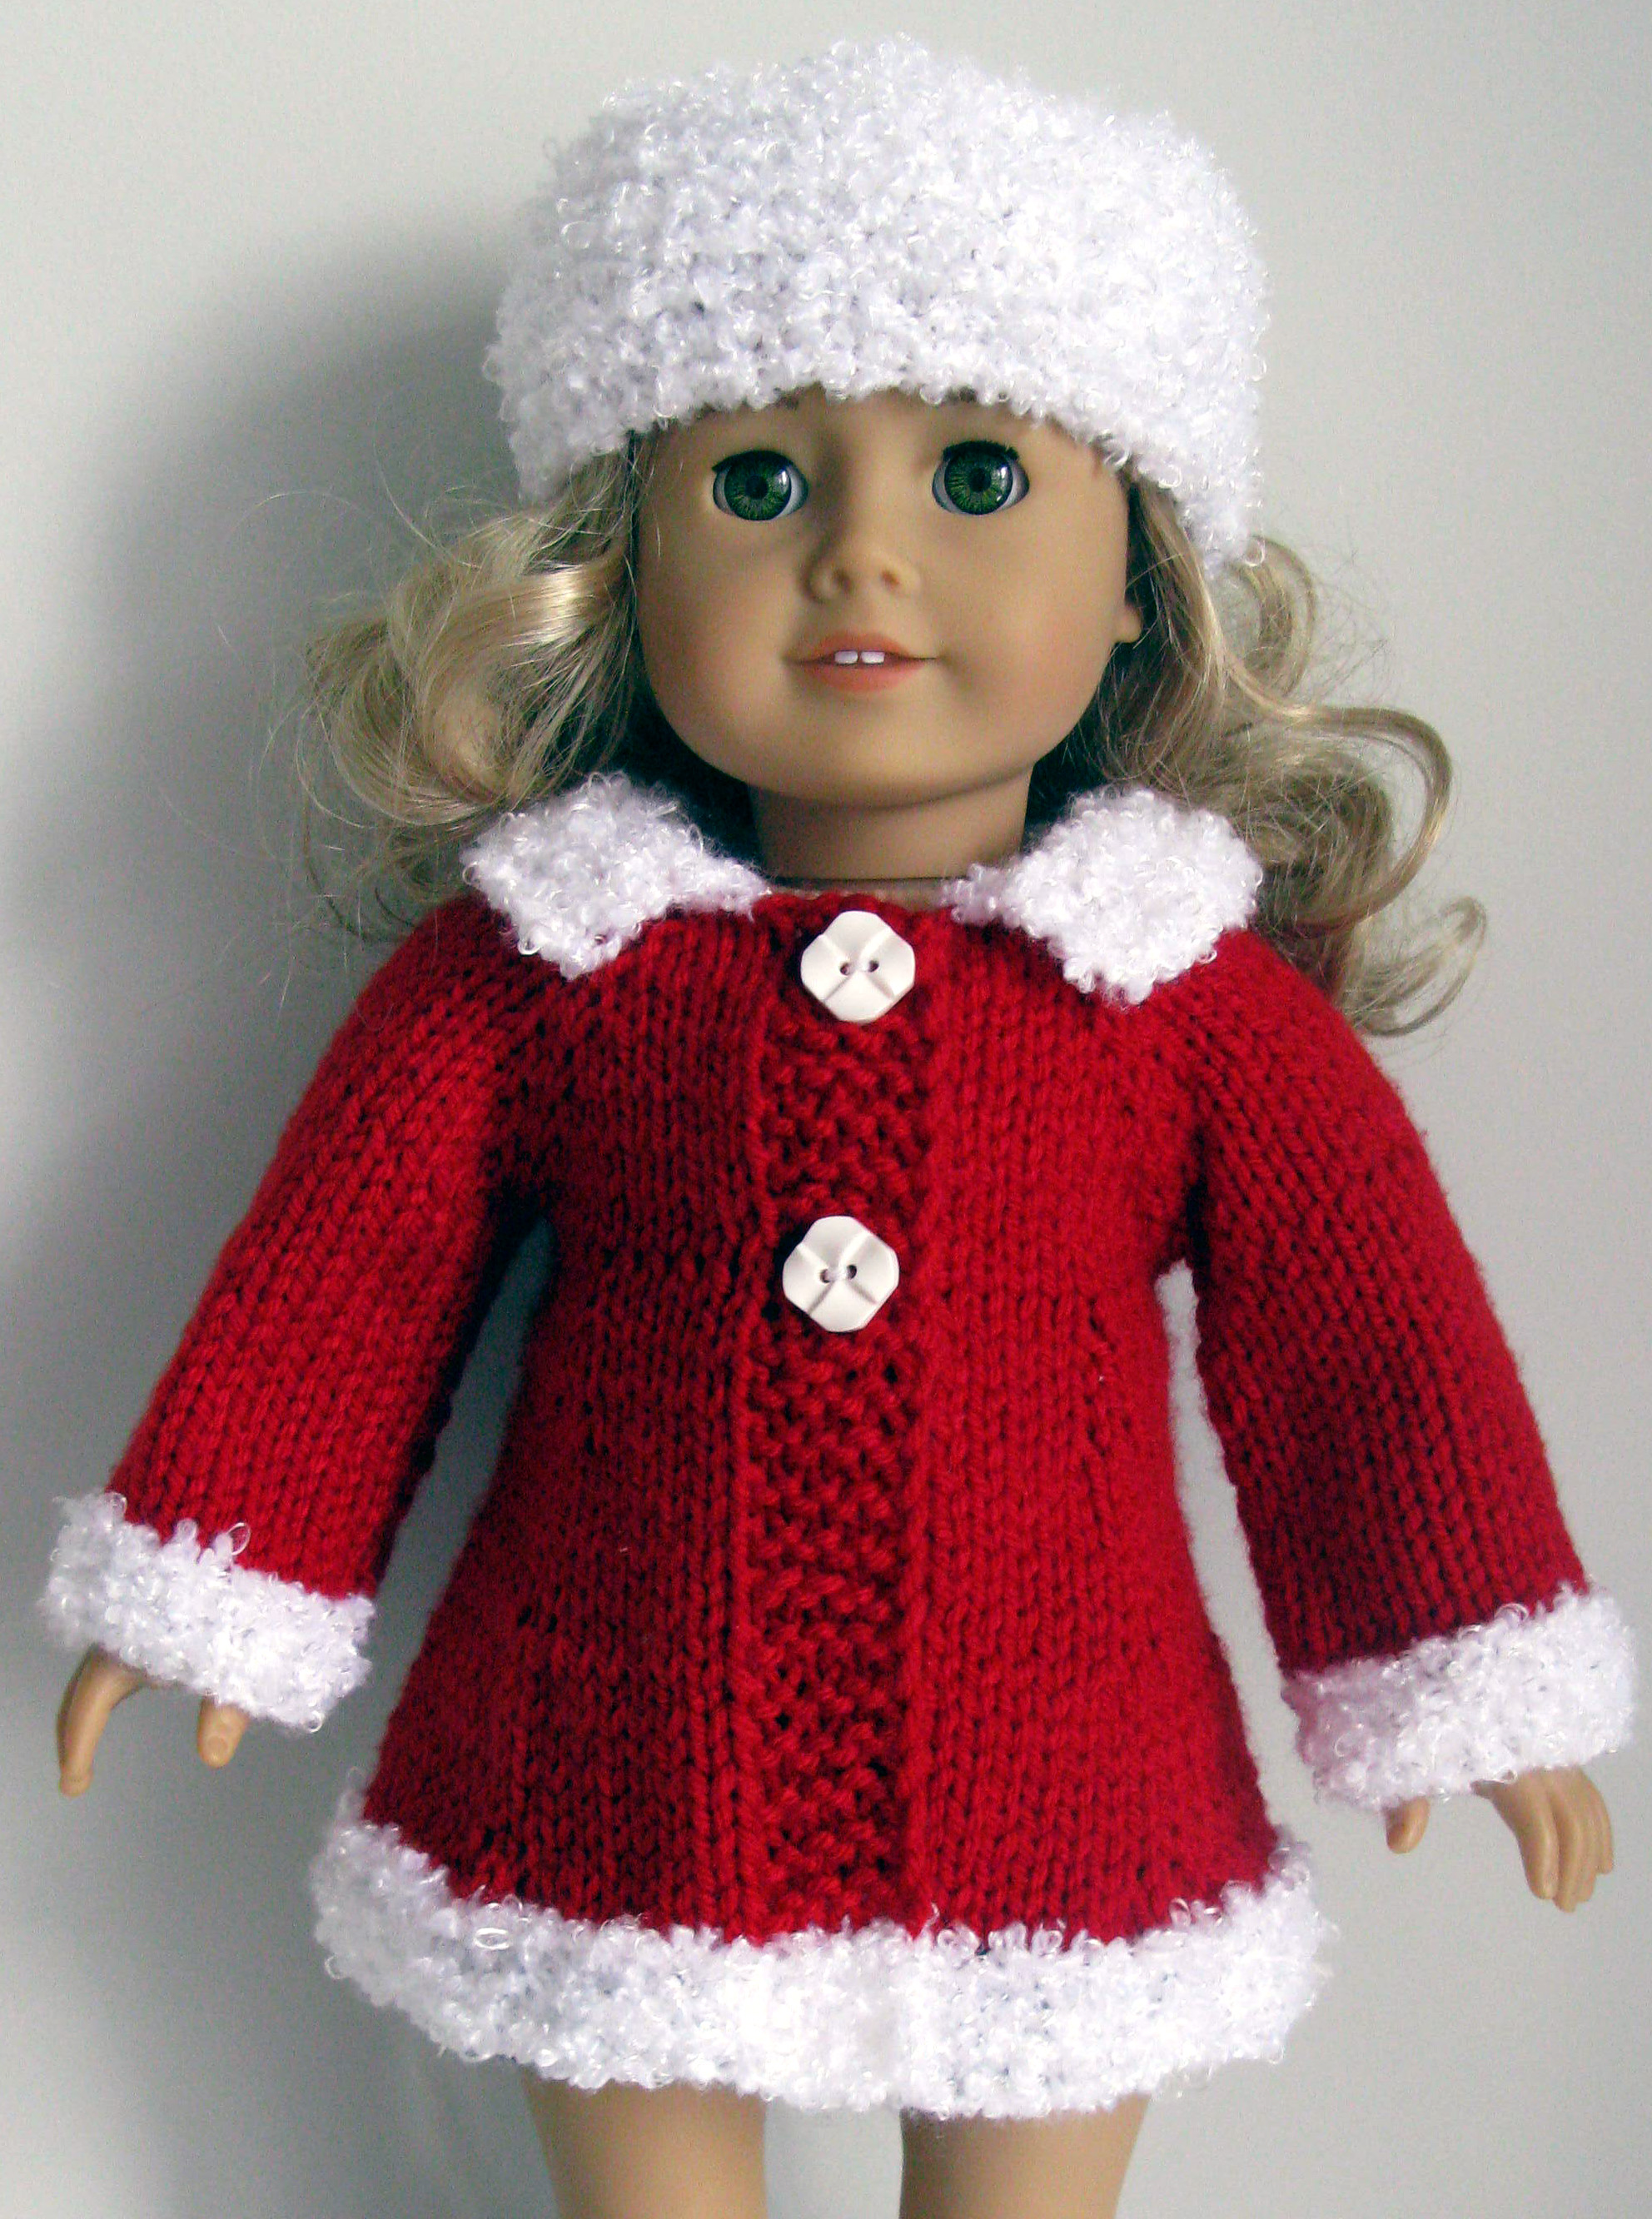 Knitting Dress For Girl : Mad men winter set knitting pattern knit n play